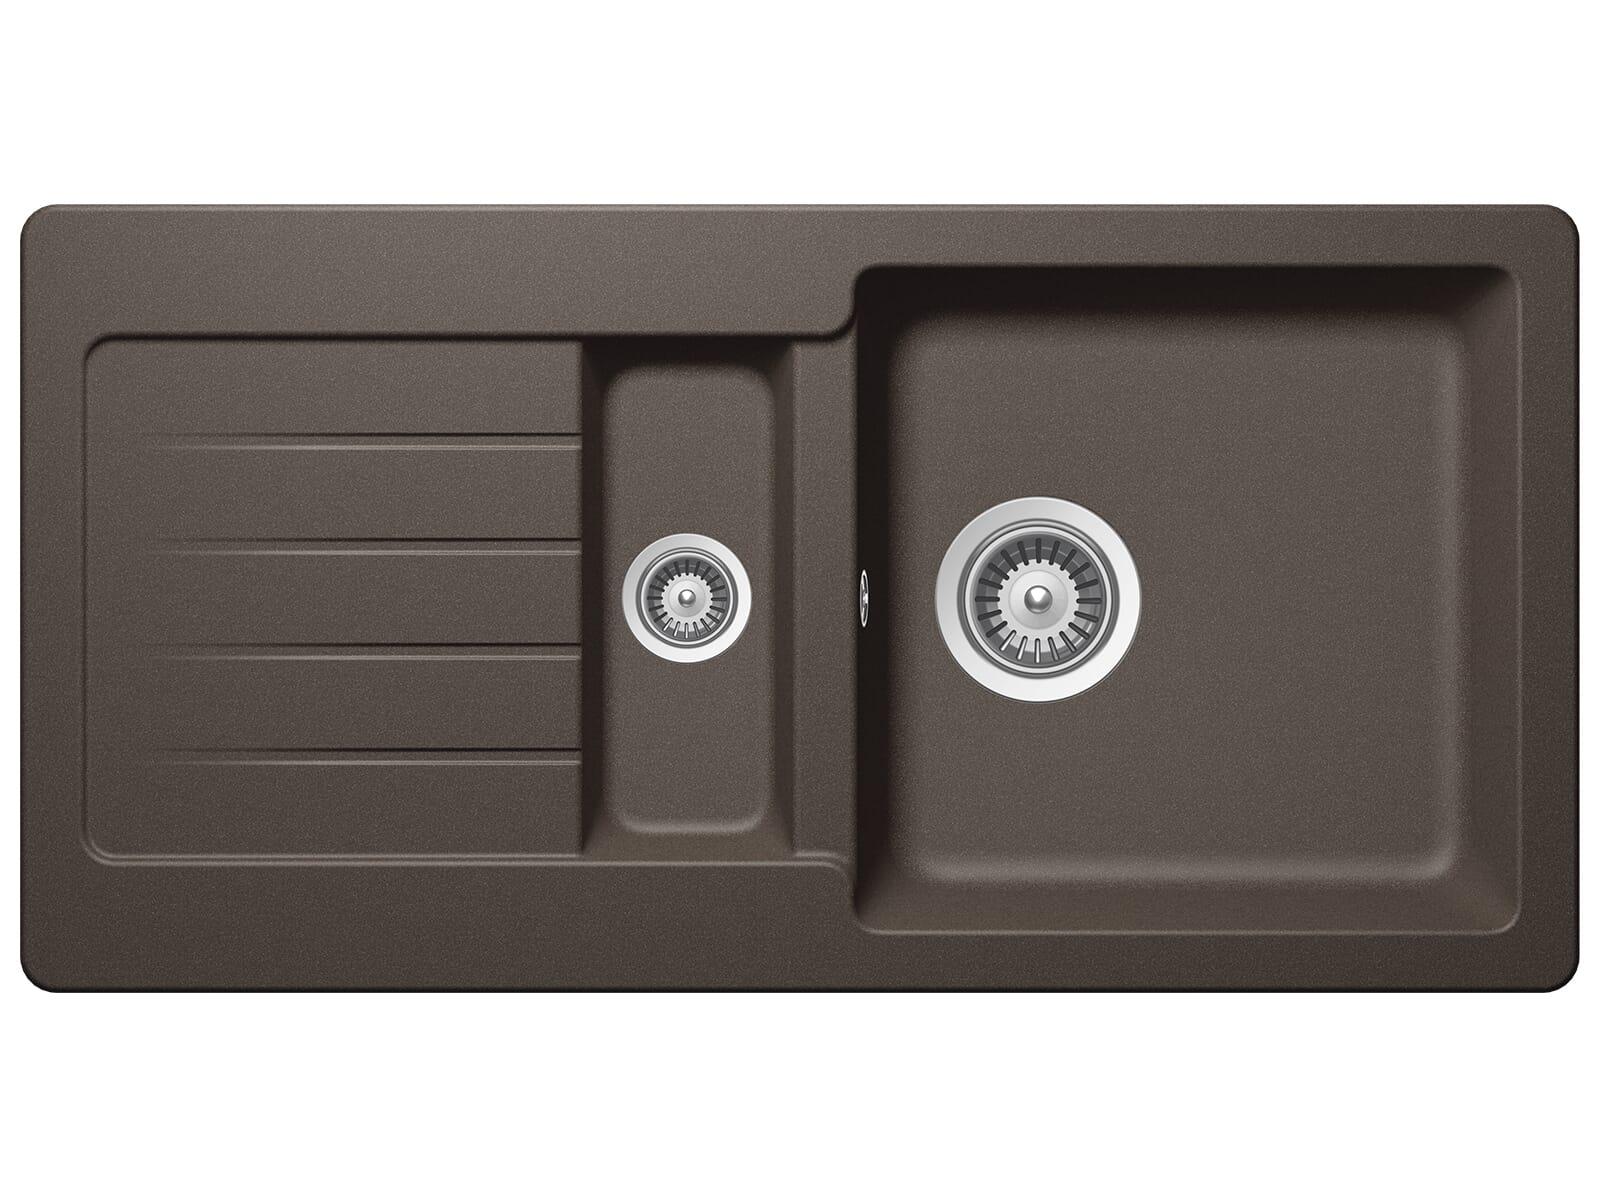 Schock Typos D-150S A Inca - TYPD150SAINC Granitspüle